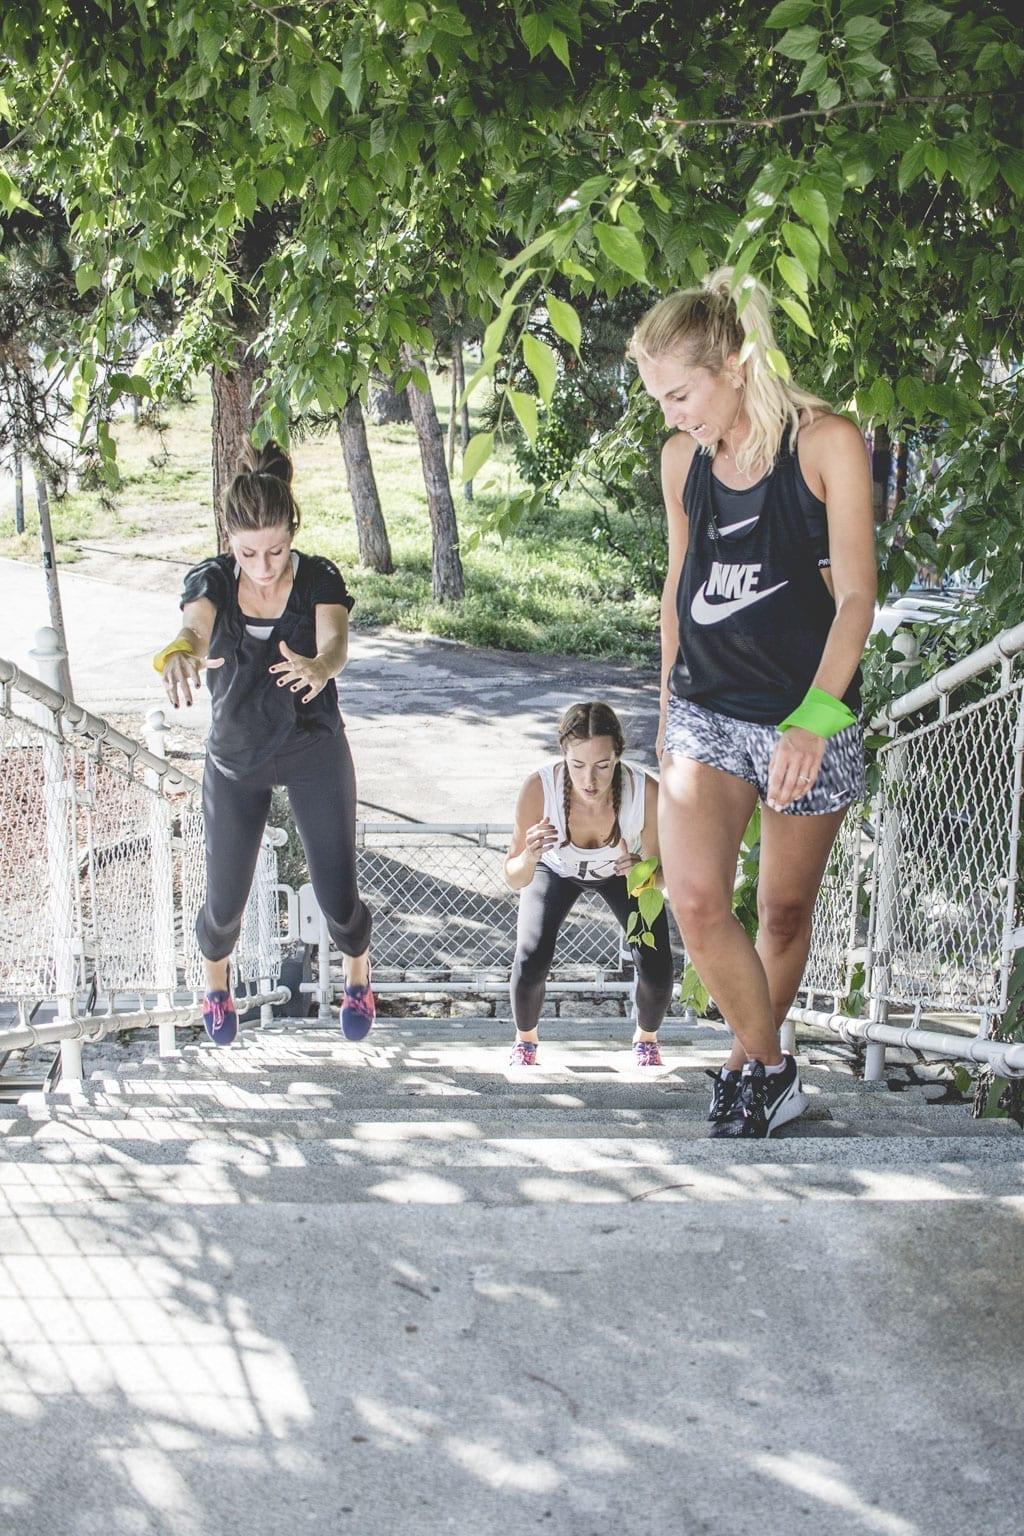 CK-1606-constantly-k-karin-kaswurm-daily-dose-fashion-lifestyle-blog-vicky-heiler-kathi-schmalzl-workout-21